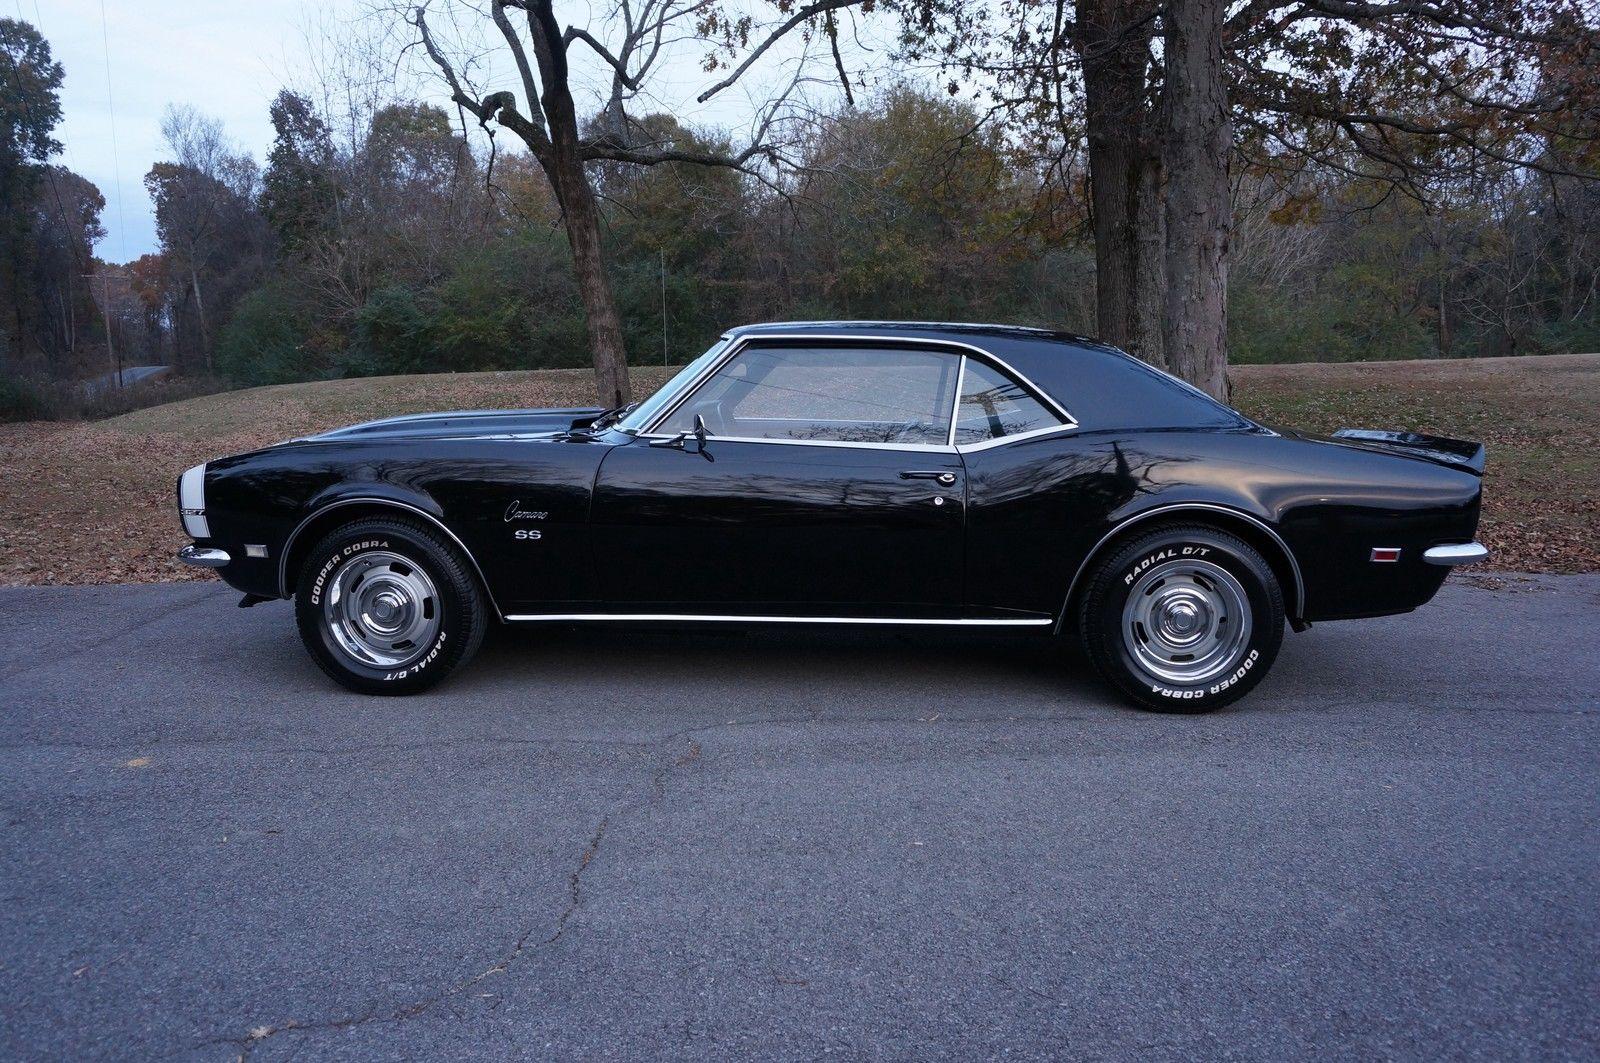 1968 Chevrolet Camaro Muscle Car Hot Rod 350 Classic